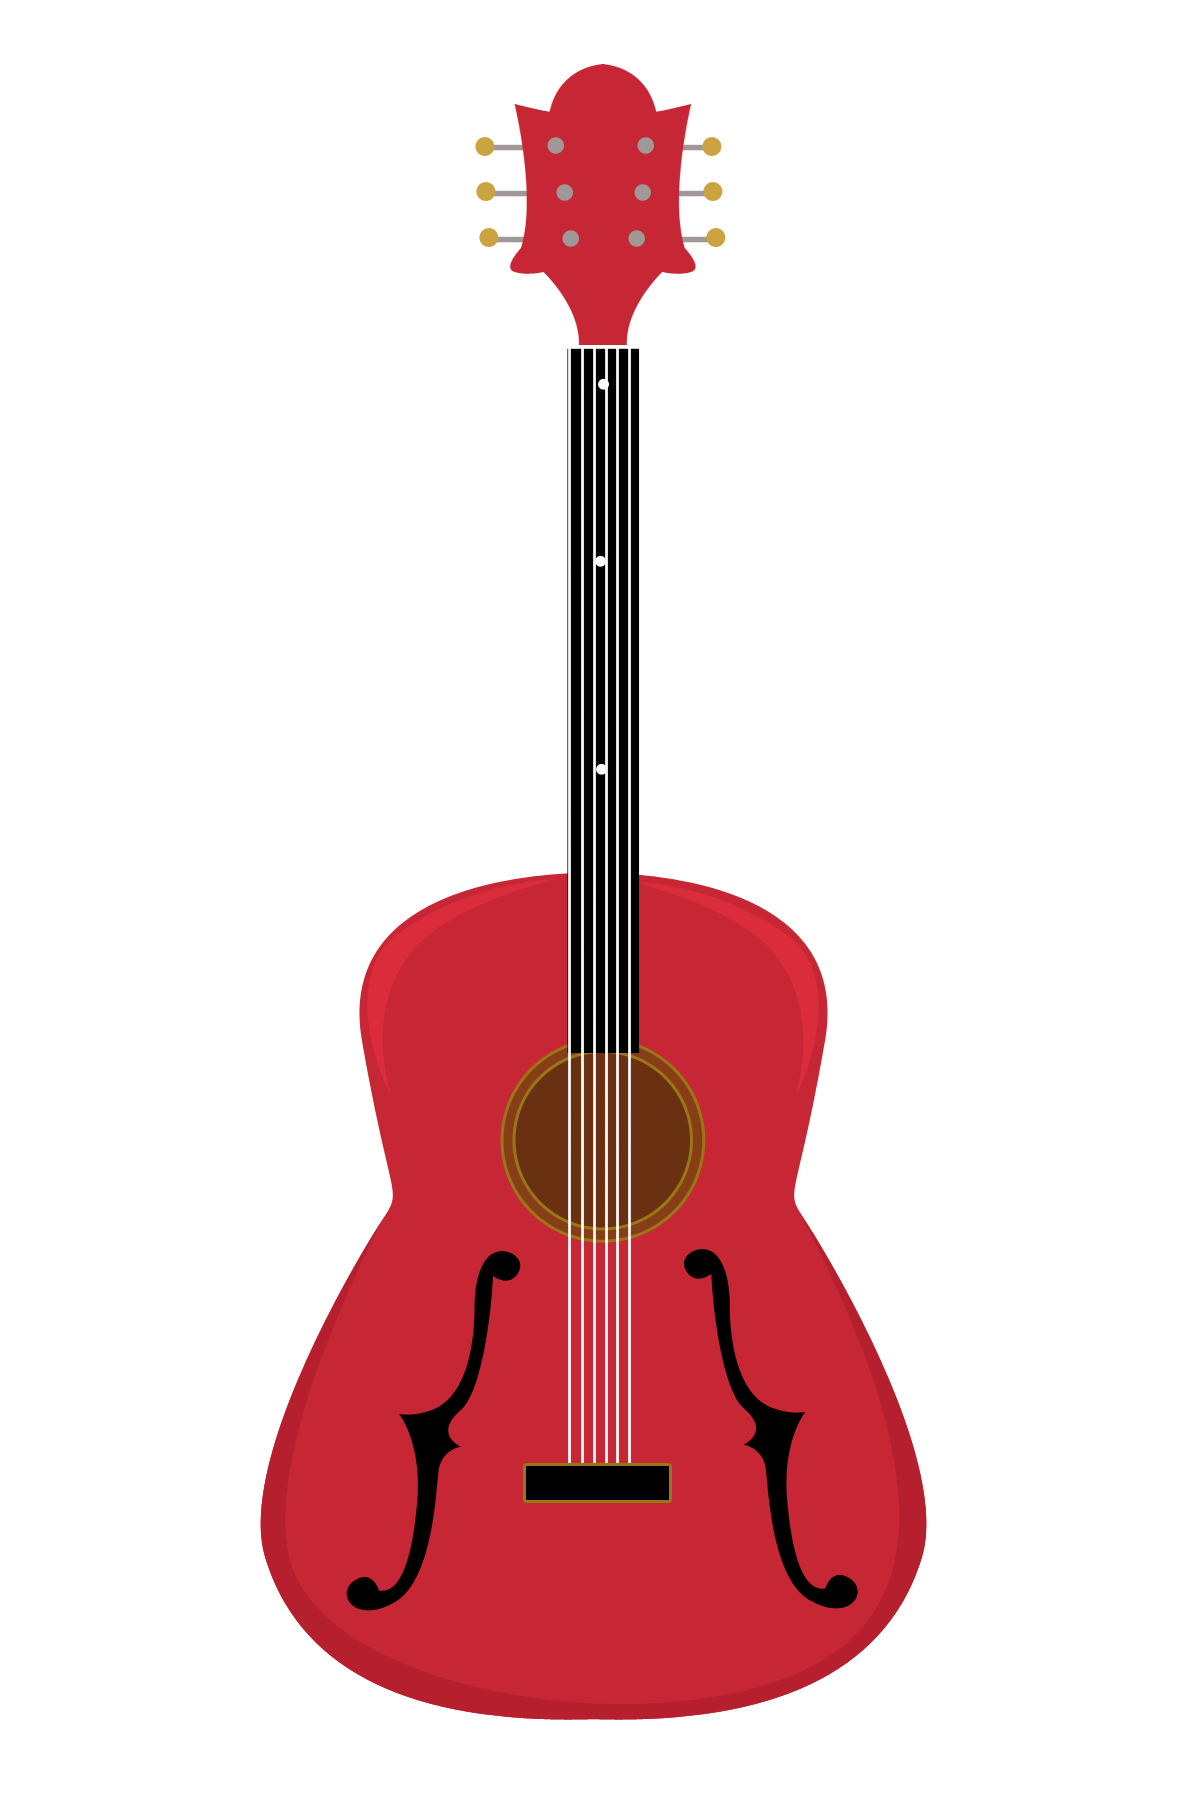 Clipart guitar file. Photo by daniellemoraesfalcao minus